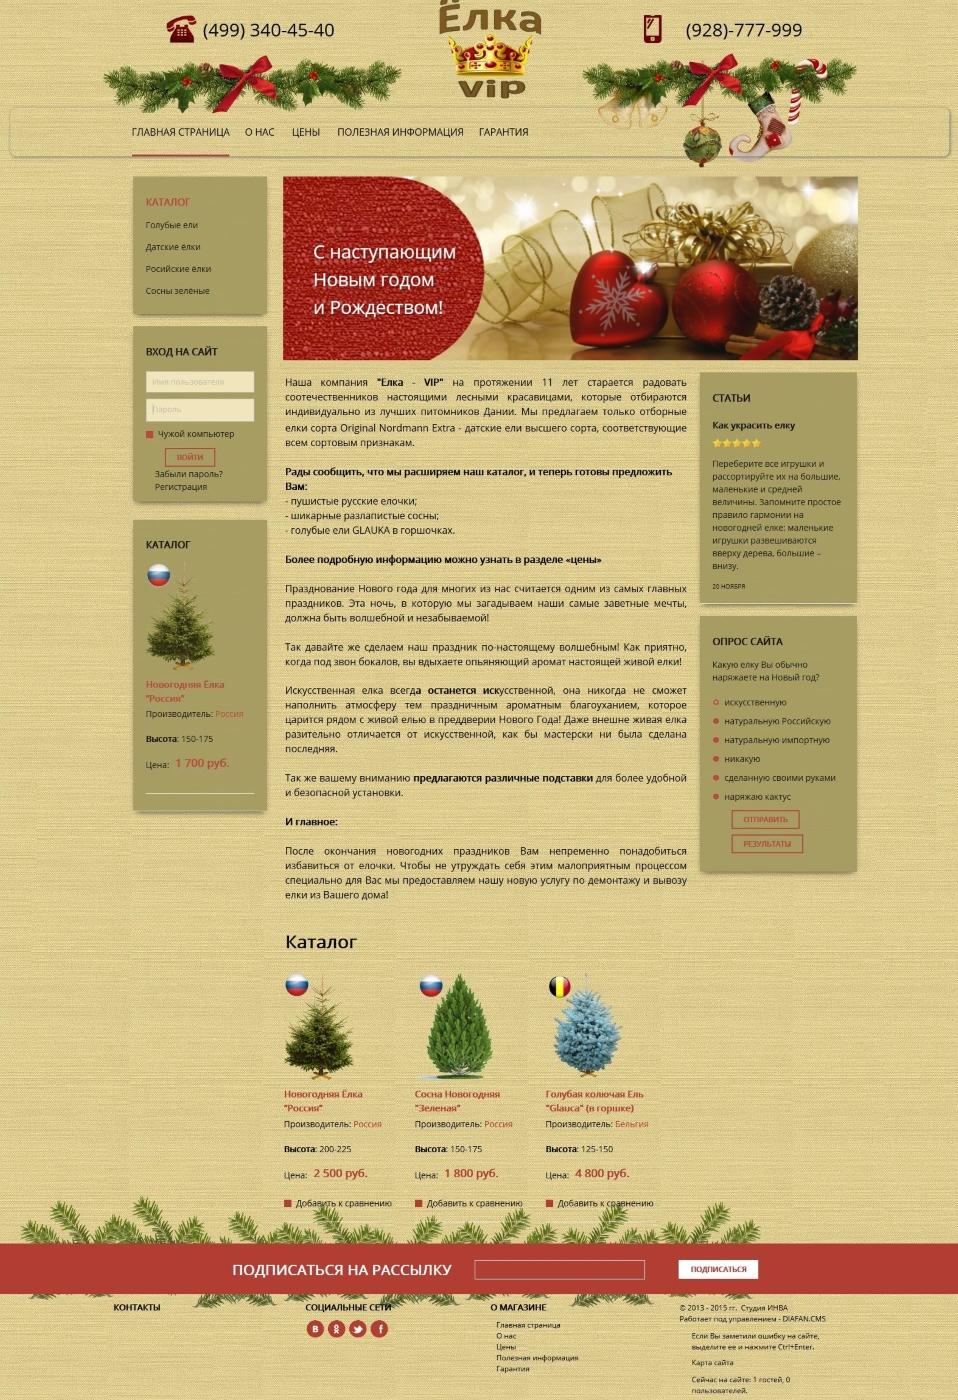 Вид нового сайта для Компании Елка-vip